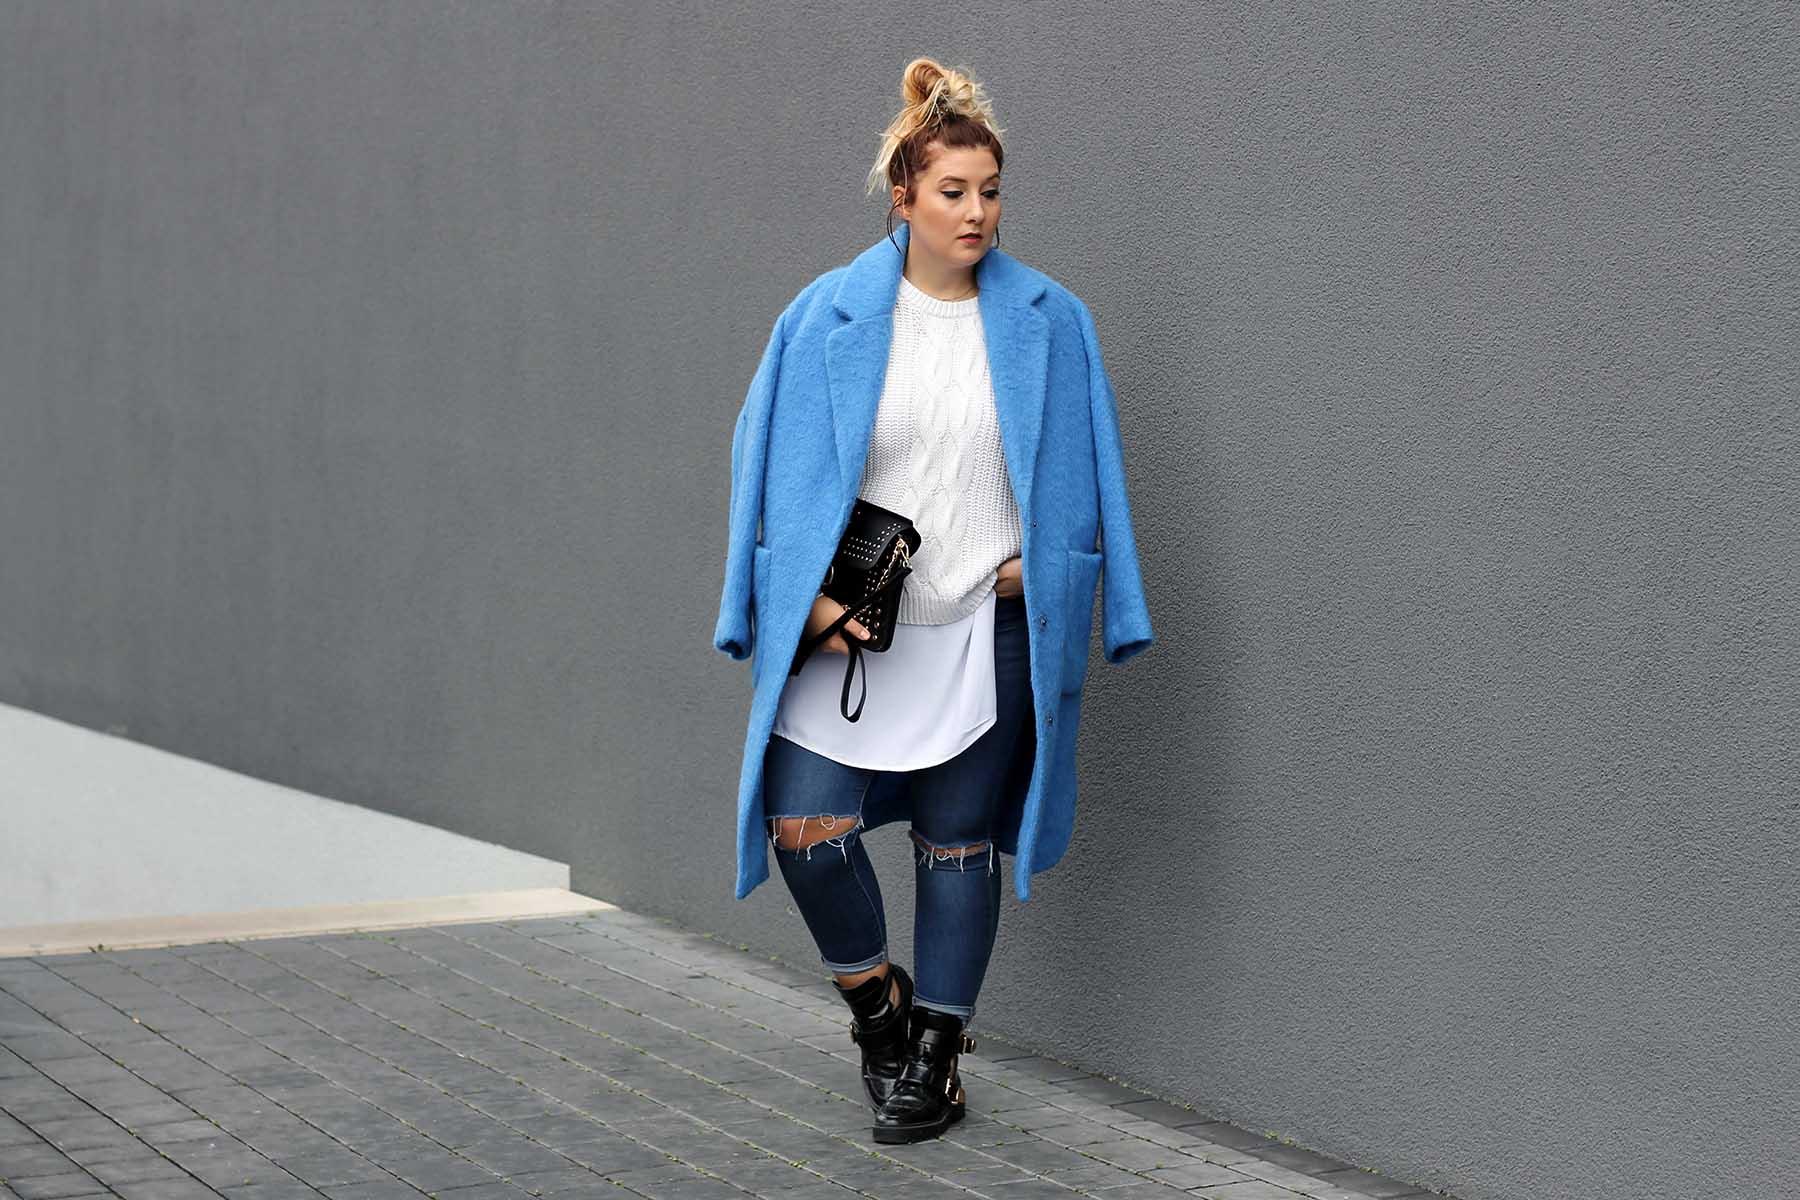 outfit-look-style-modeblog-fashionblog-blauer-mantel-jeans-balenciaga-lookalike-boots-chloe8